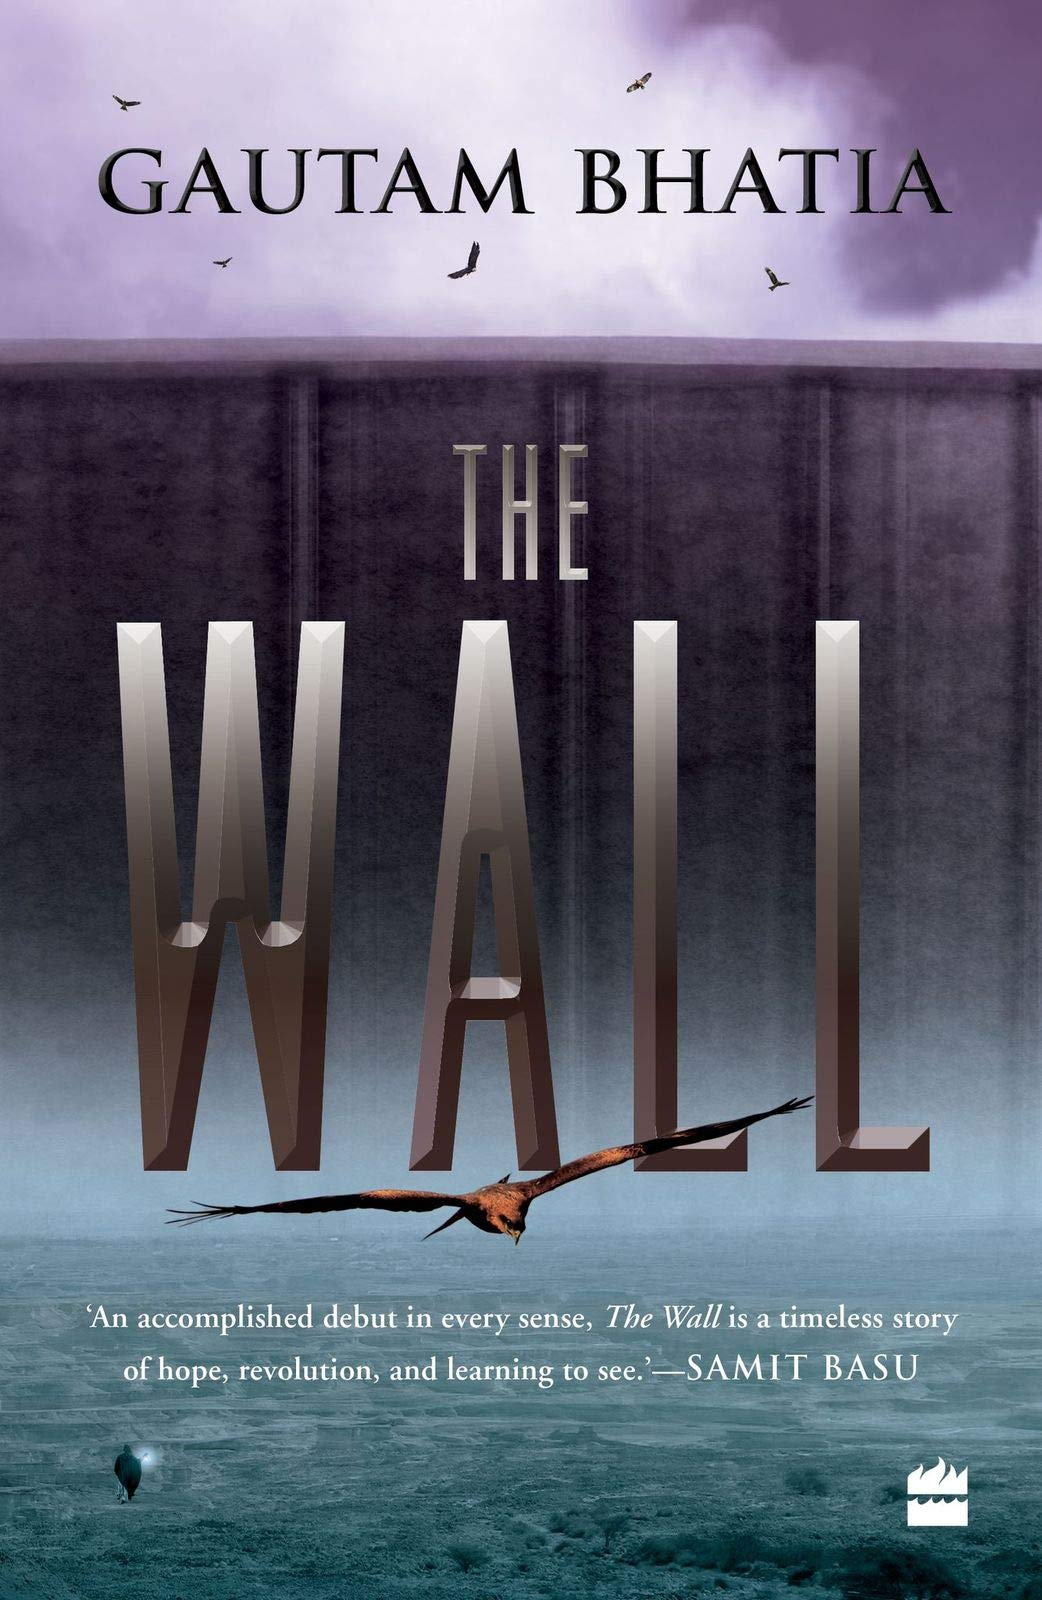 The Wall by Gautam Bhatia